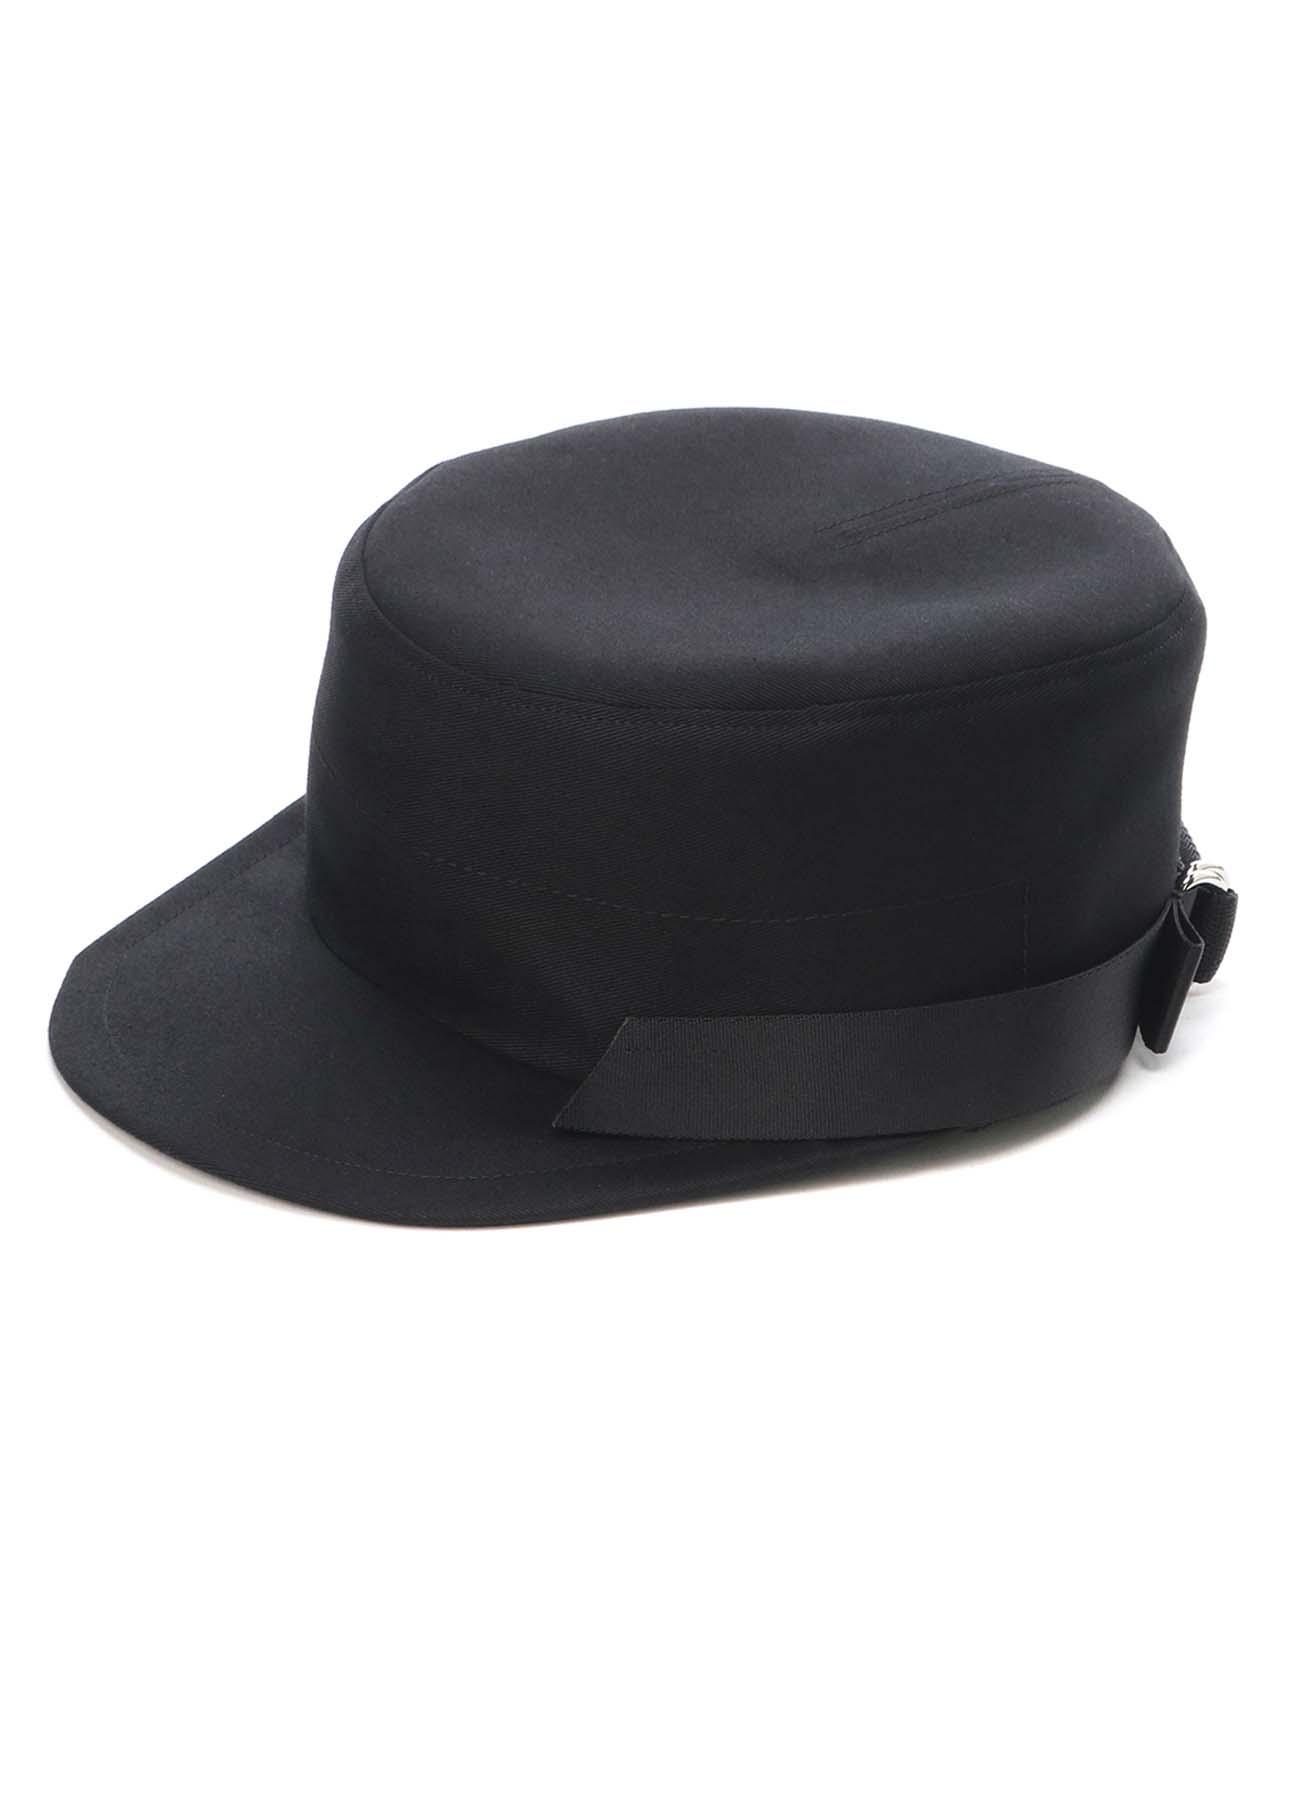 Cotton Twill Ichica Military Cap